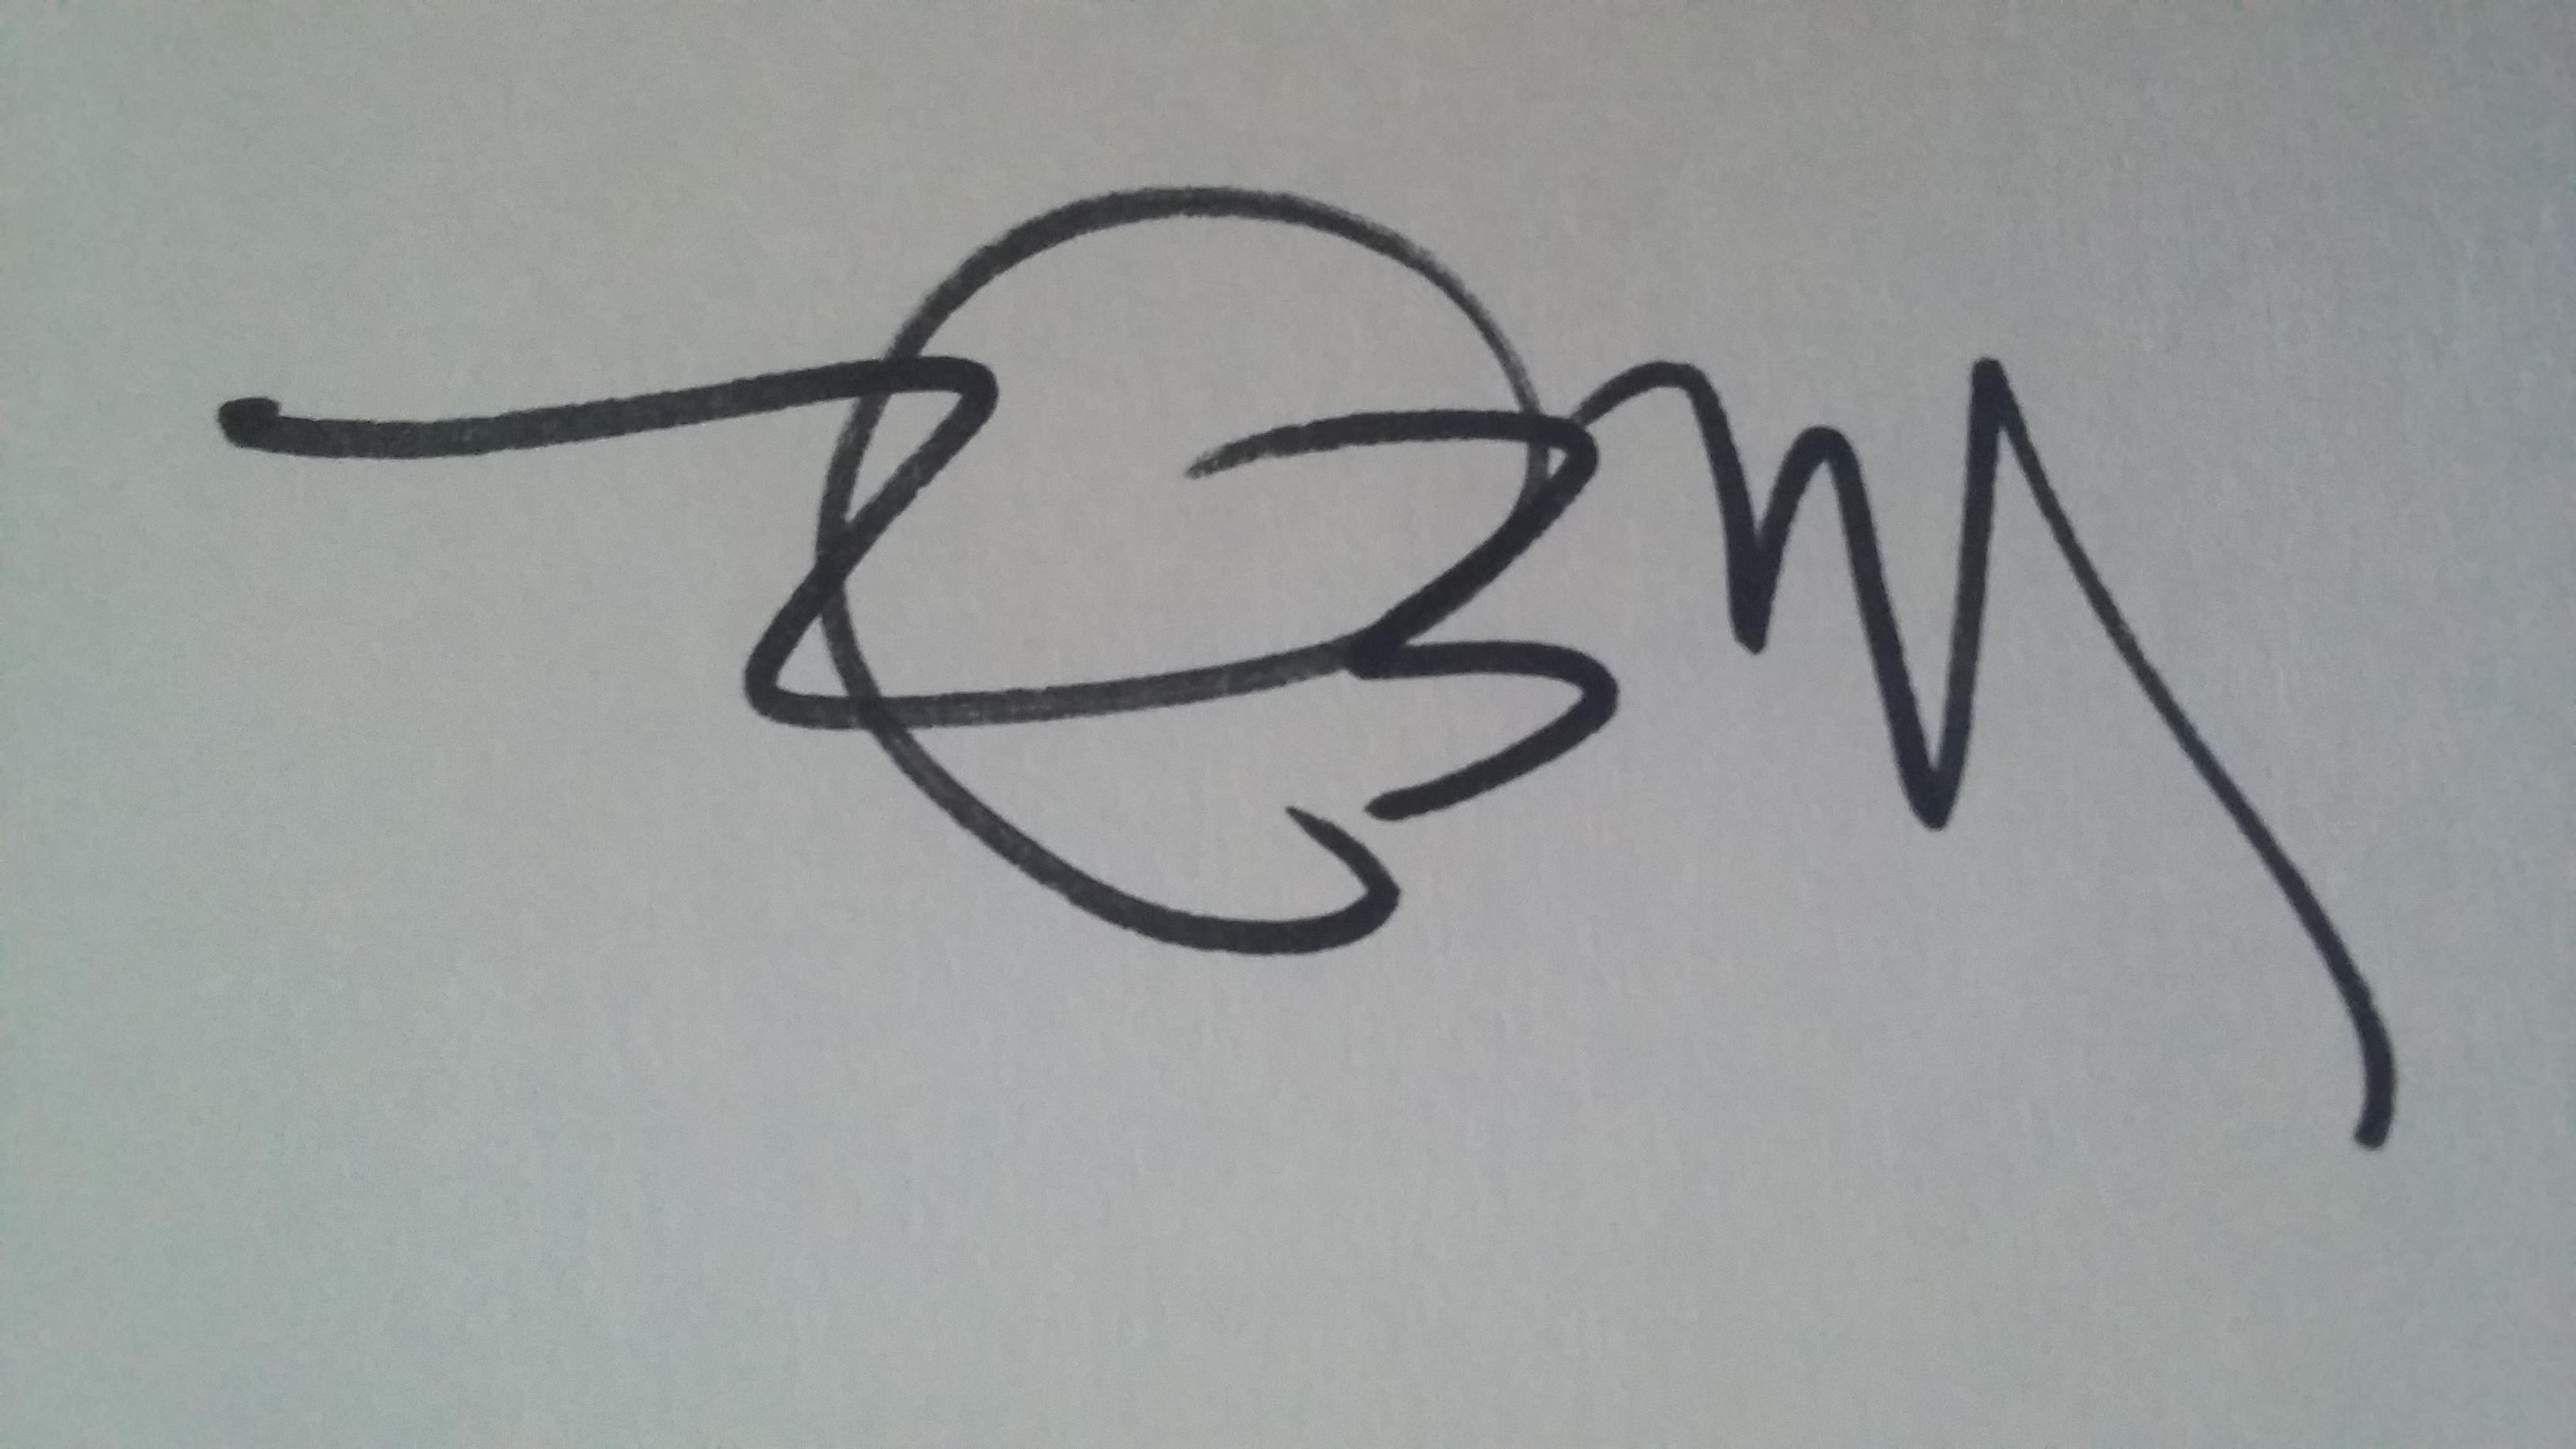 Maria Elena Ferran's Signature